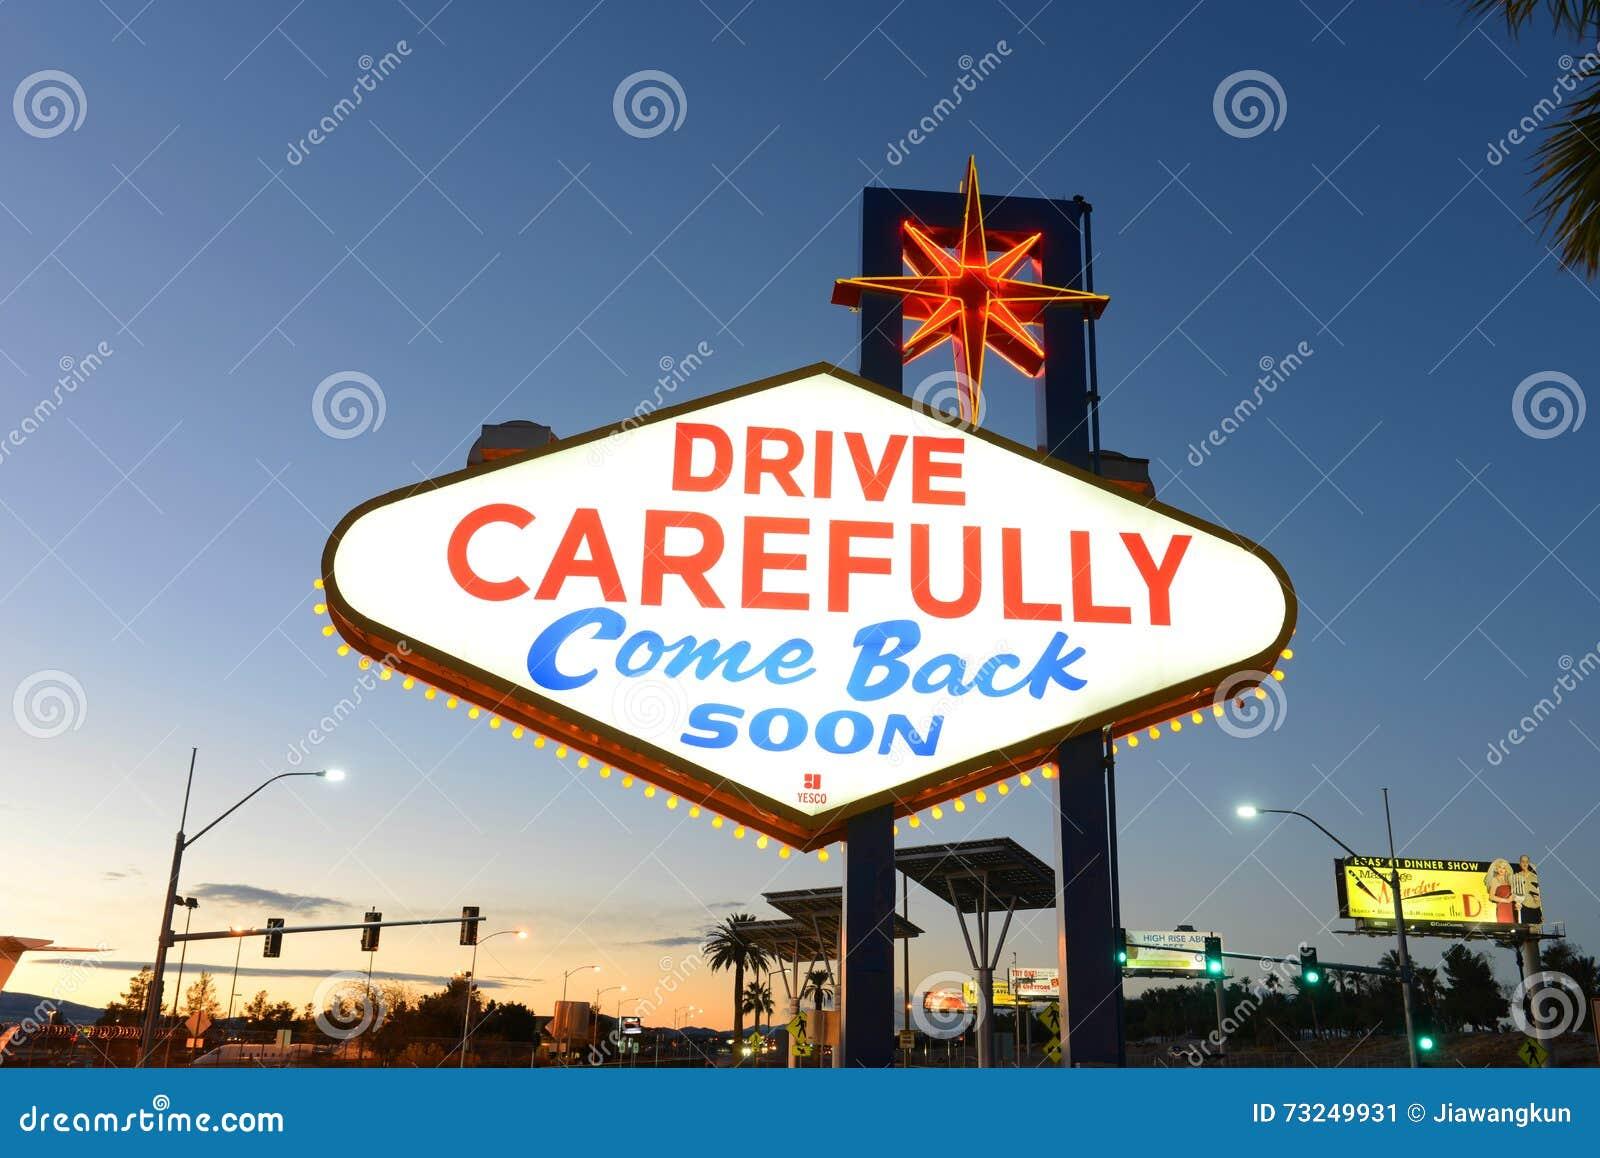 come back soon las vegas sign at sunset stock photography 5974436. Black Bedroom Furniture Sets. Home Design Ideas